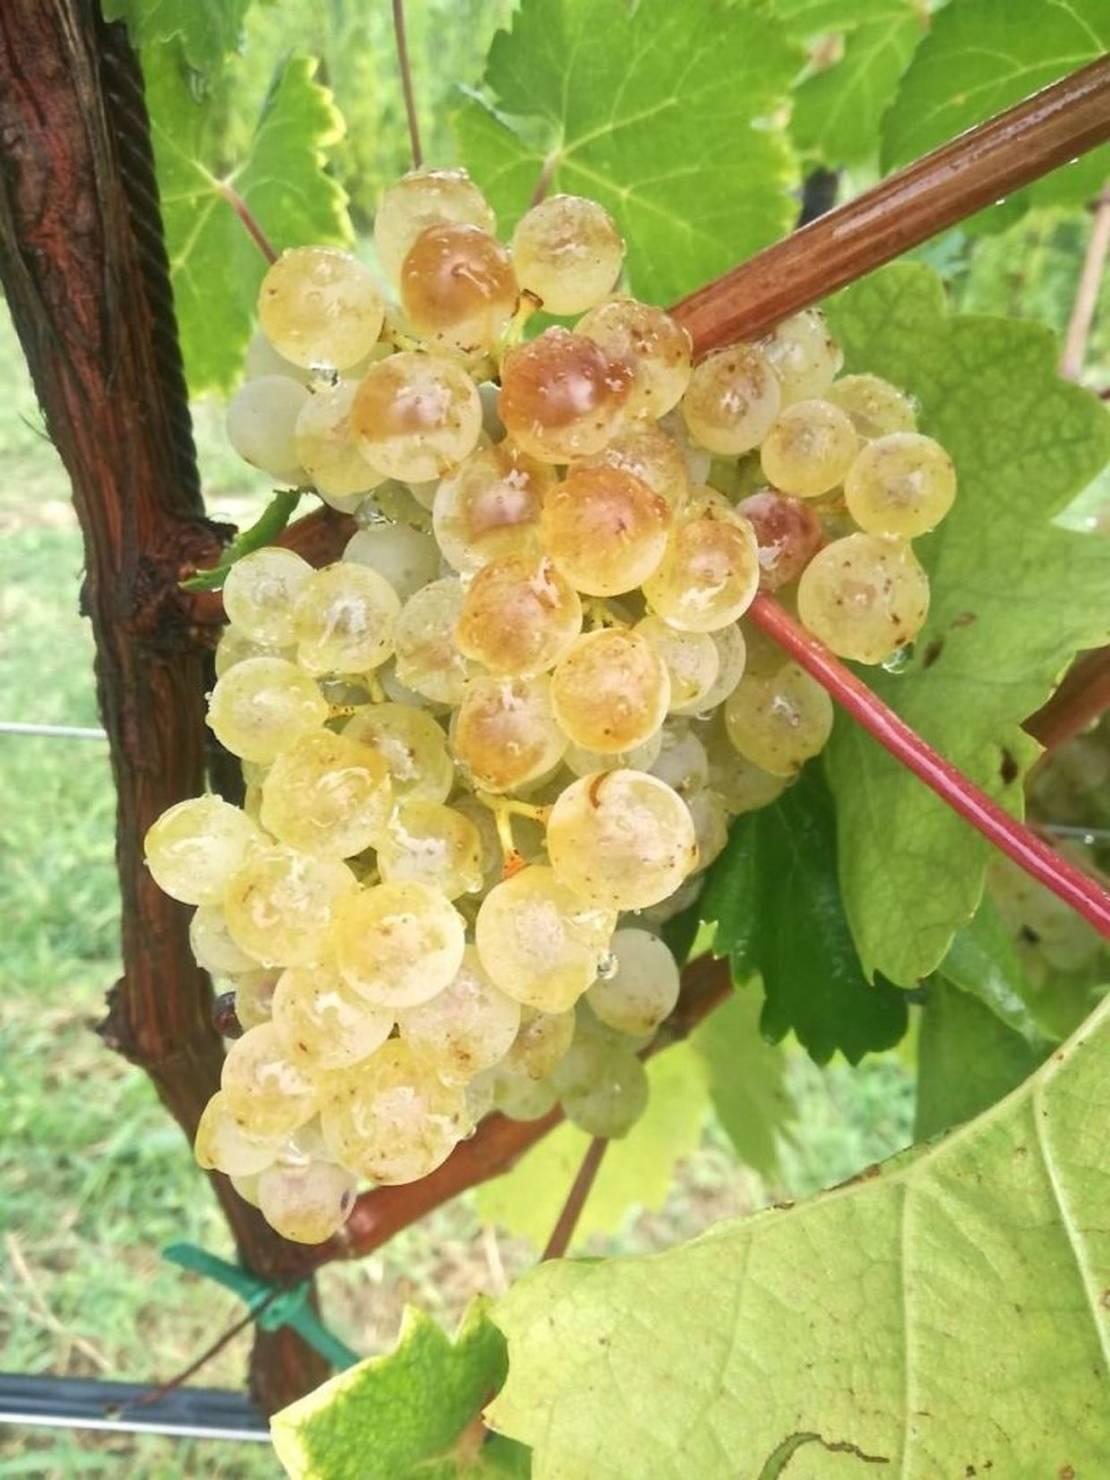 просекко, итальянское вино, вино просекко, prosecco, регион просекко